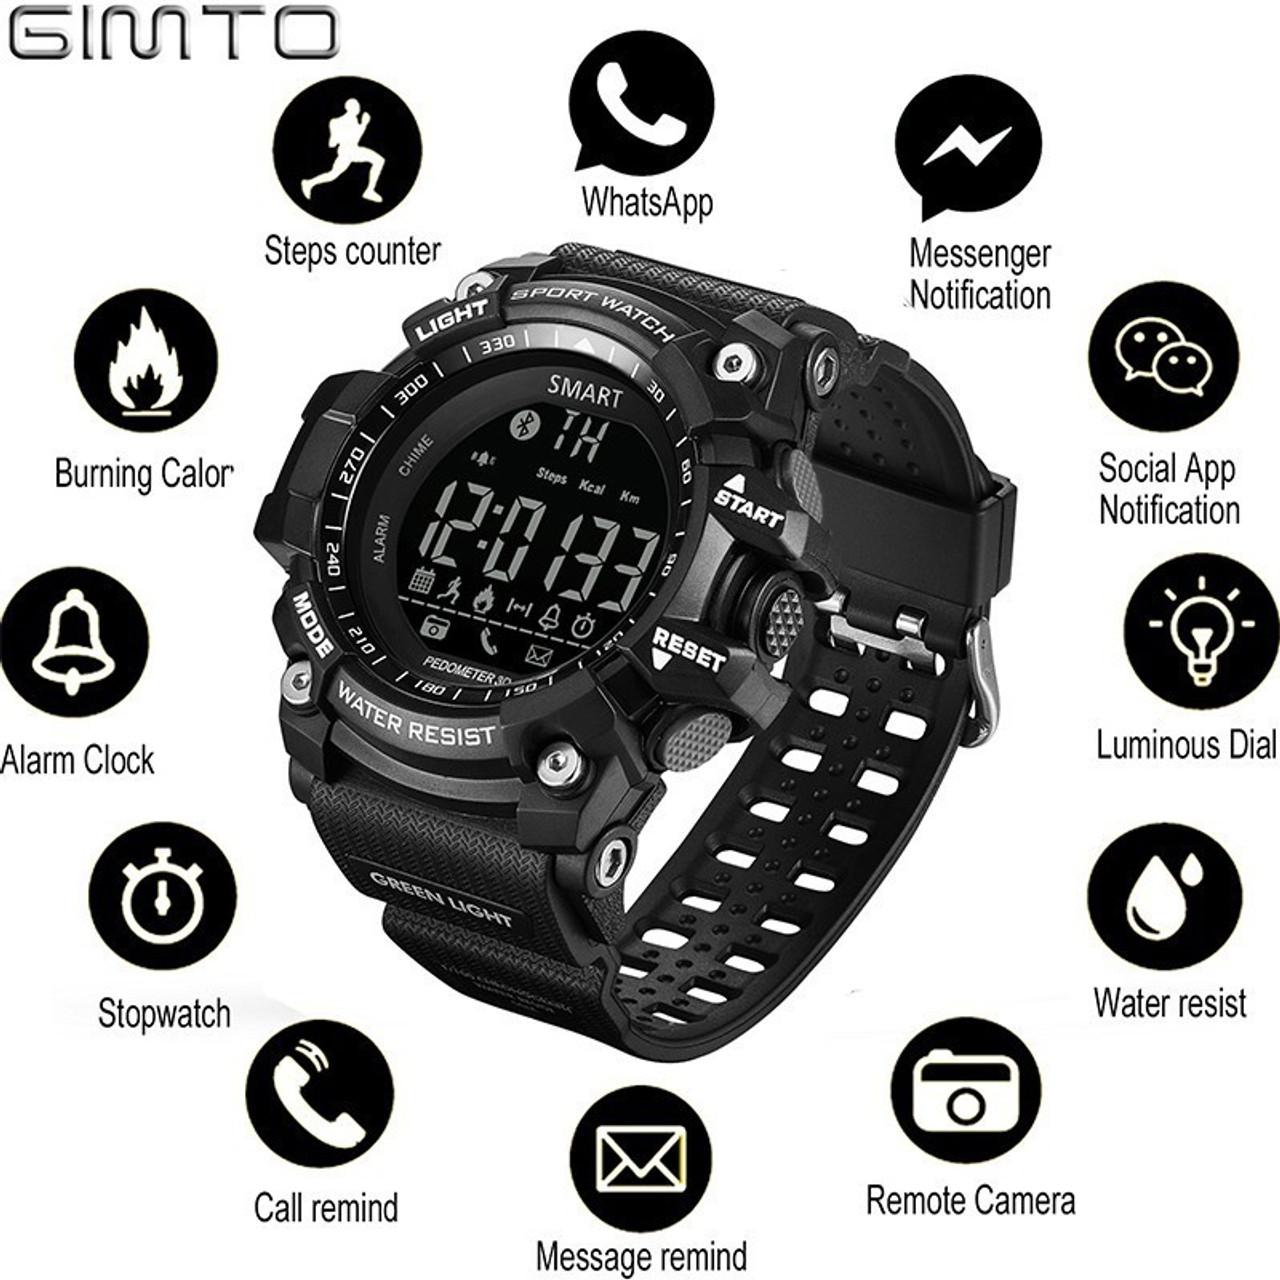 Watches Nice Digital Smart Watch Men Fashion Communication Function Digital Wristwatch Led Display Military Sport Watch Waterproof Smartwatch Digital Watches